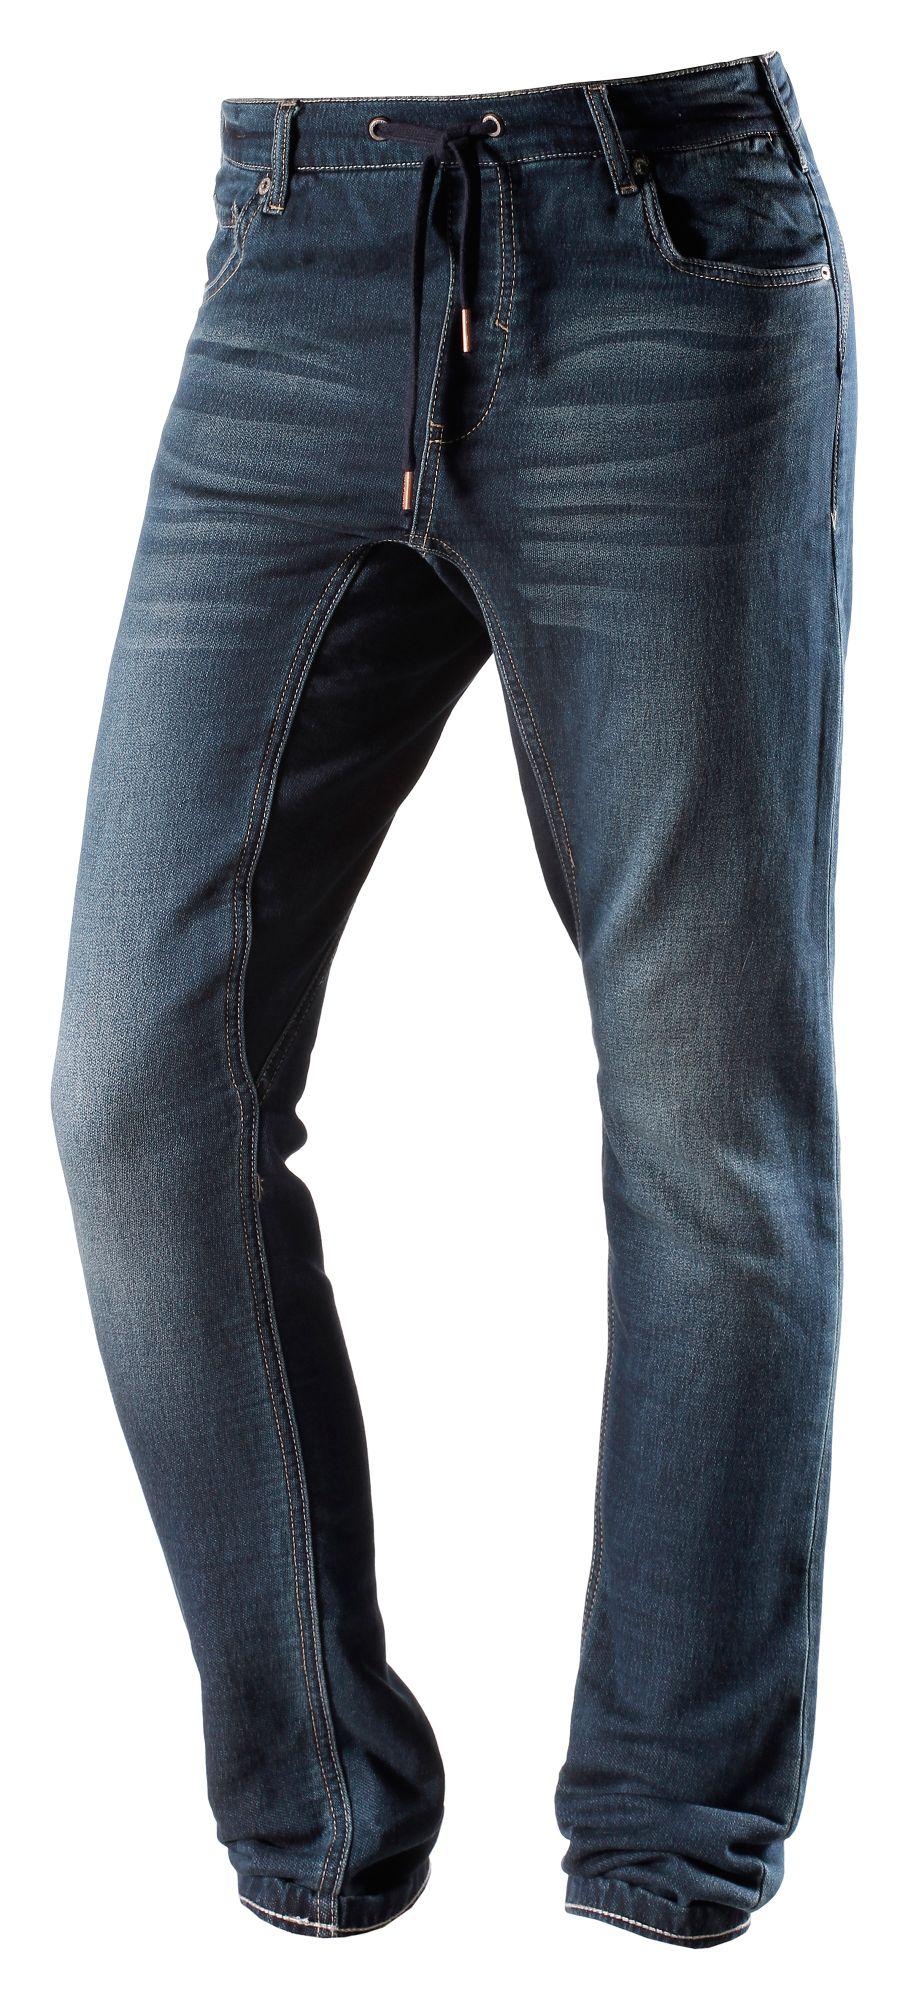 Bild adidas Sweat Jeans Damen